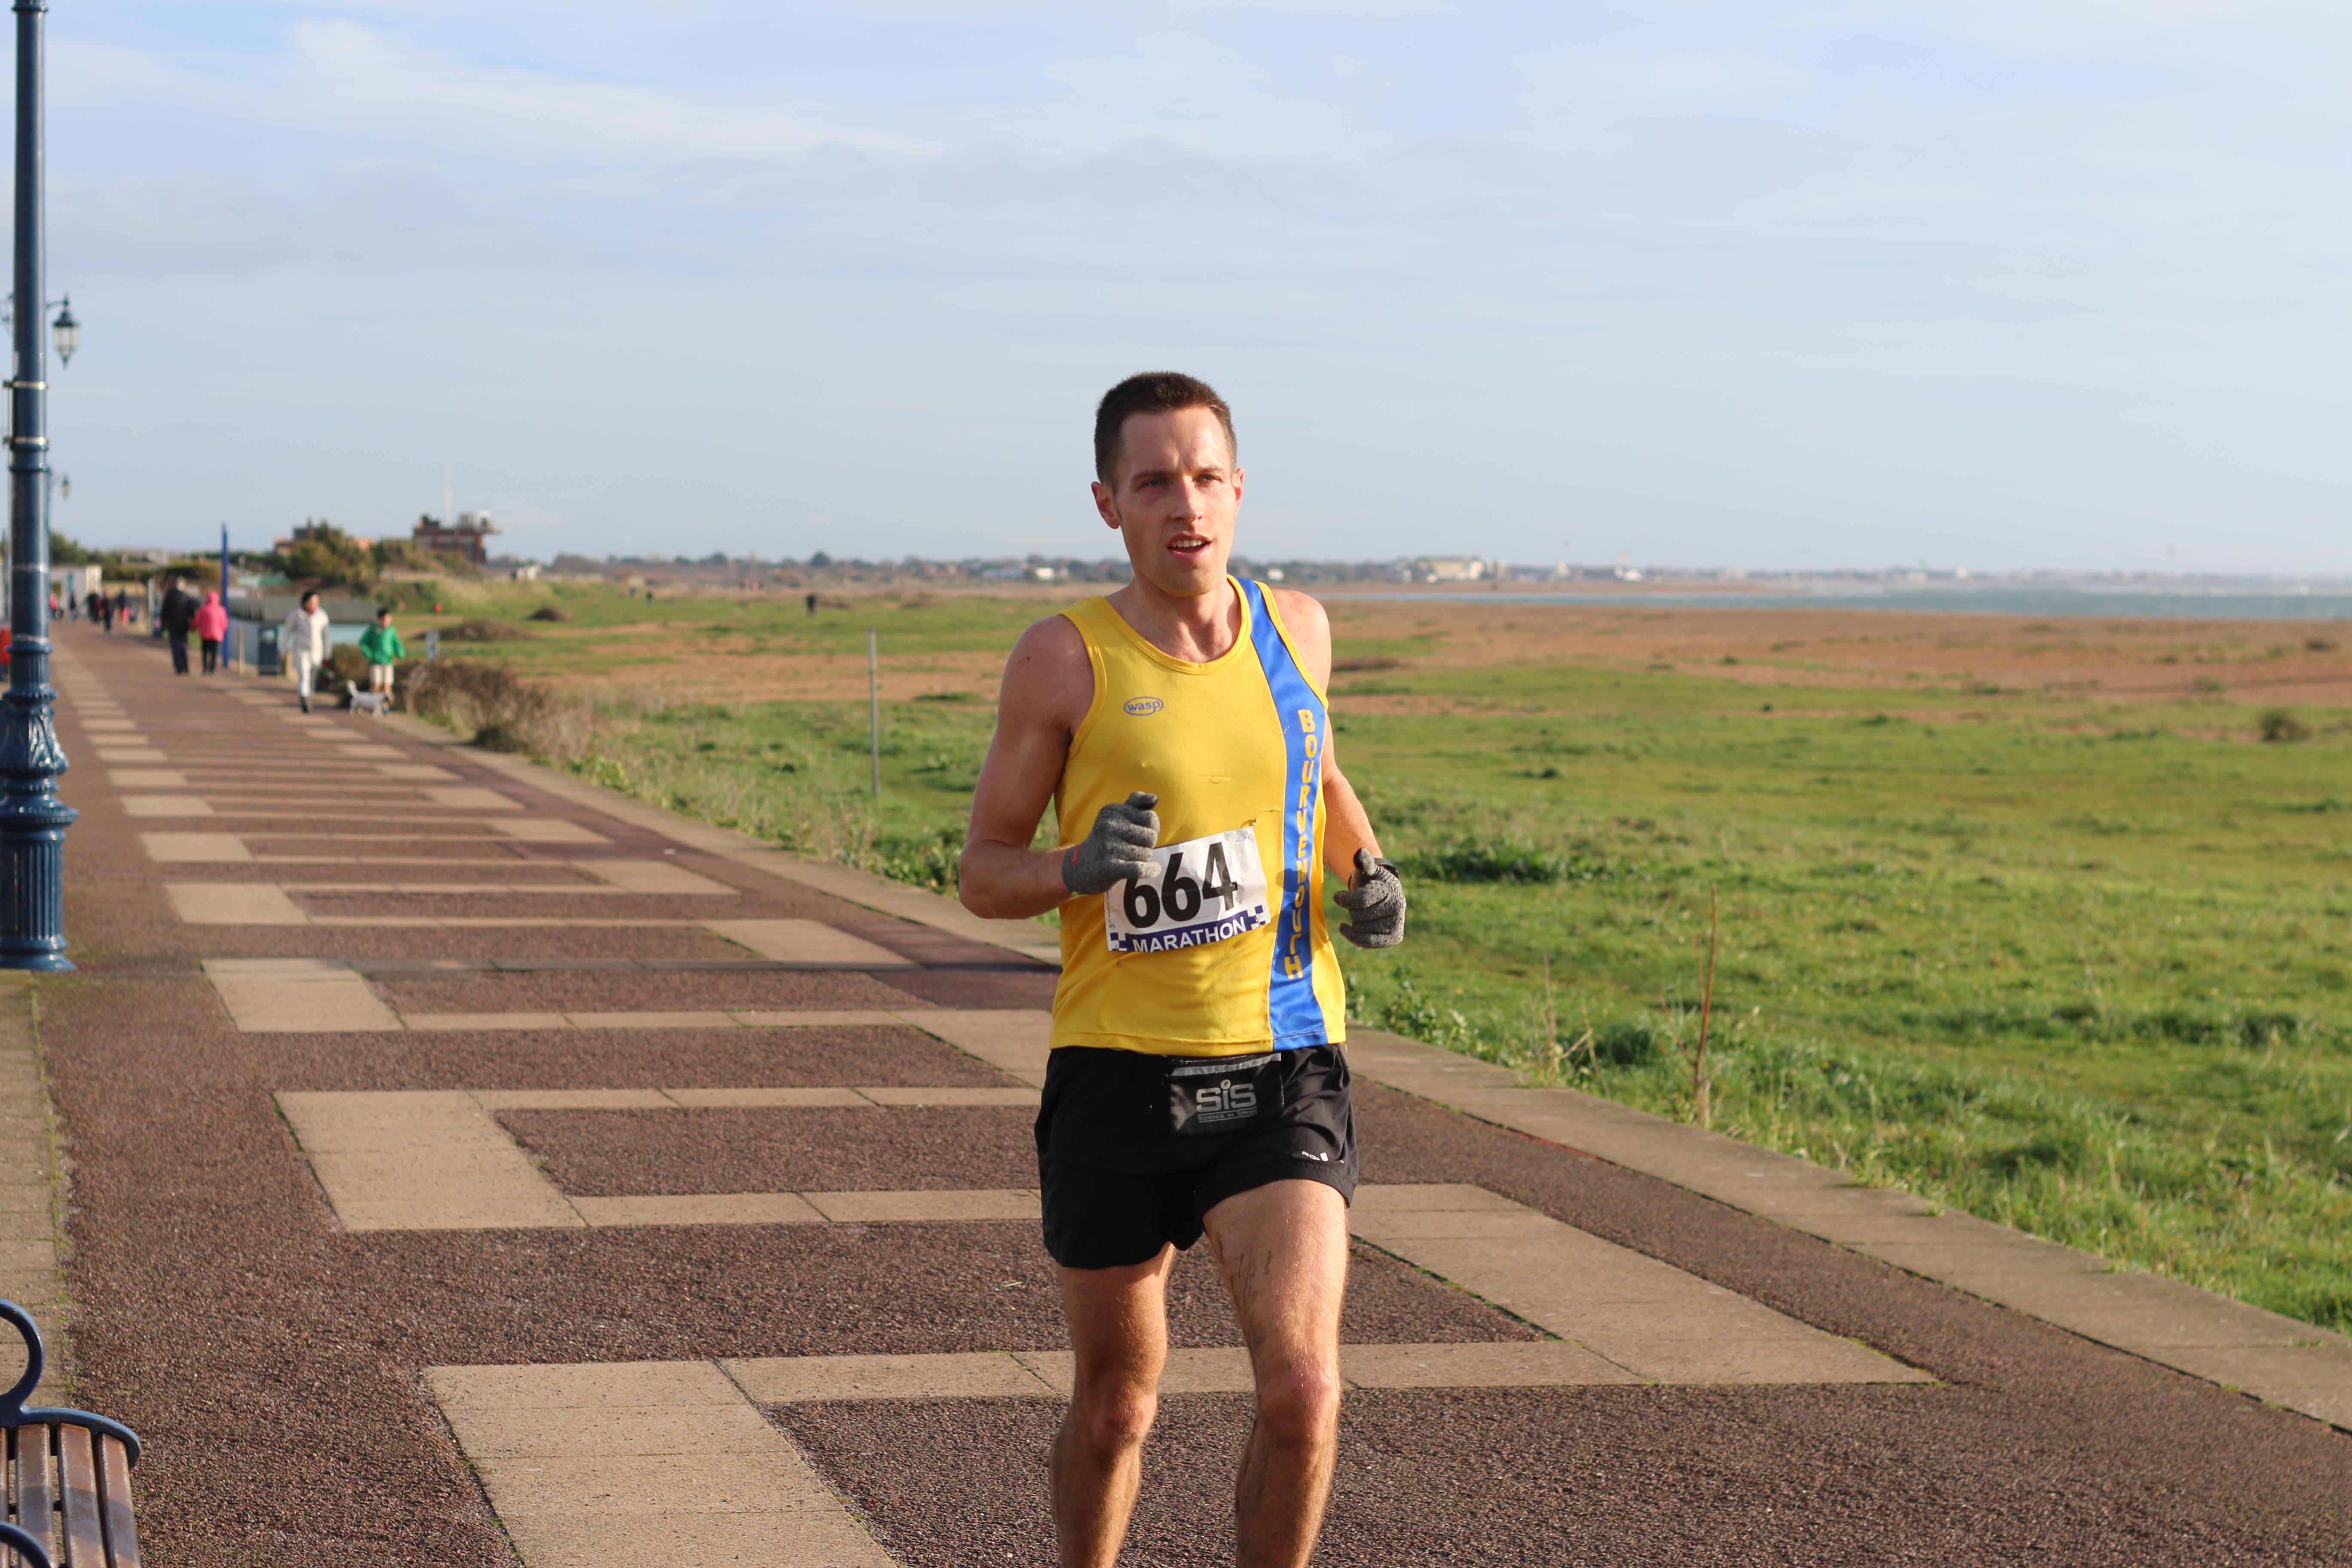 Stu Nicholas makes his way in the Portsmouth Coastal Marathon